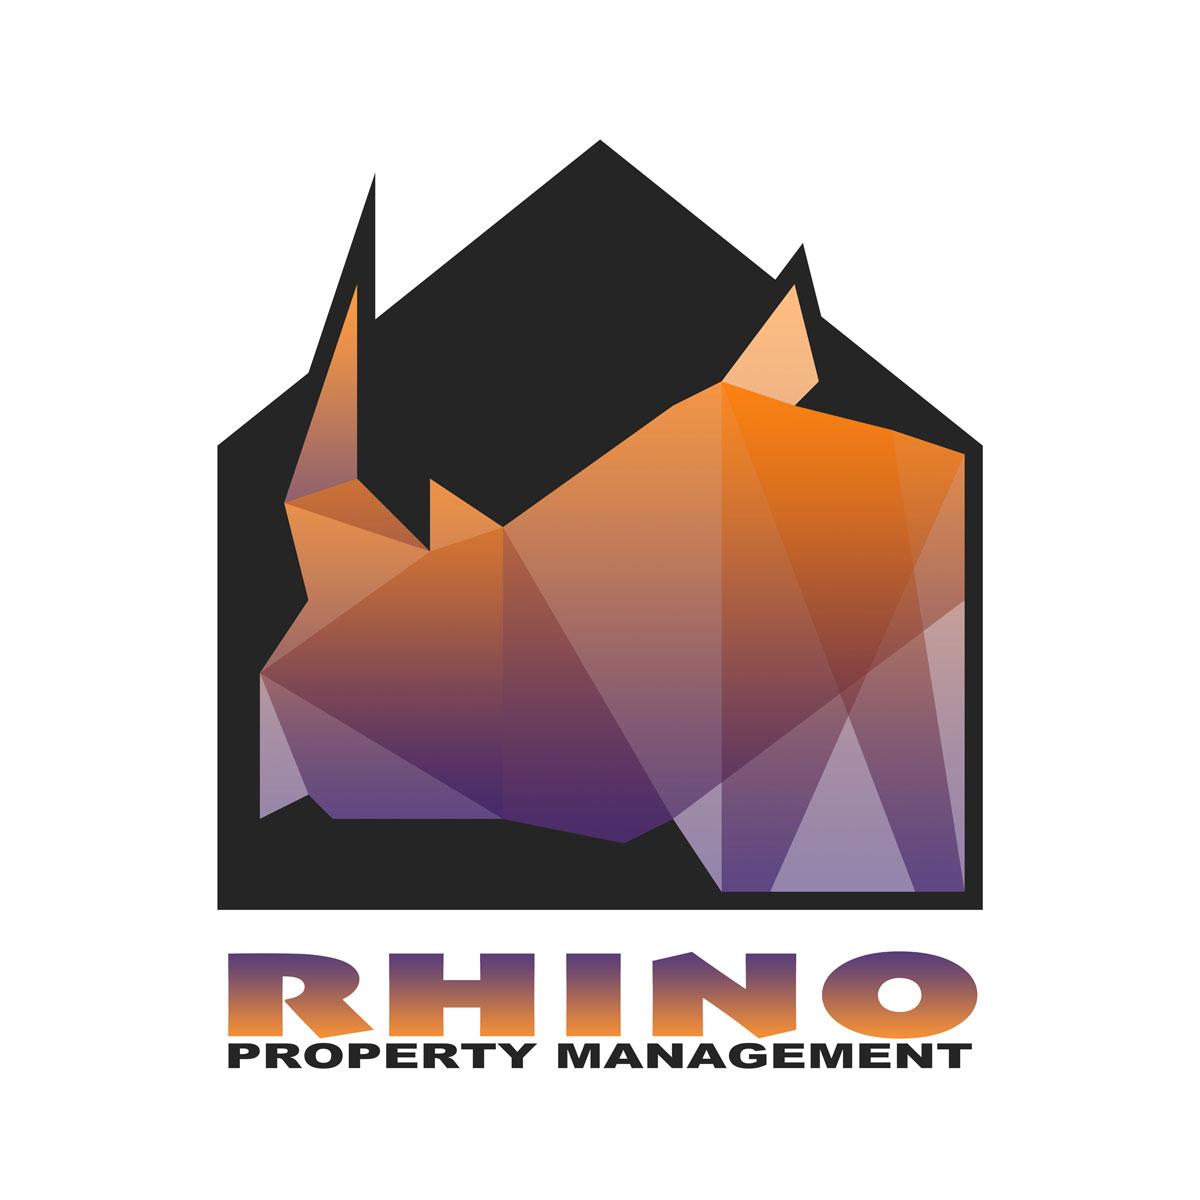 rhino property management logo square